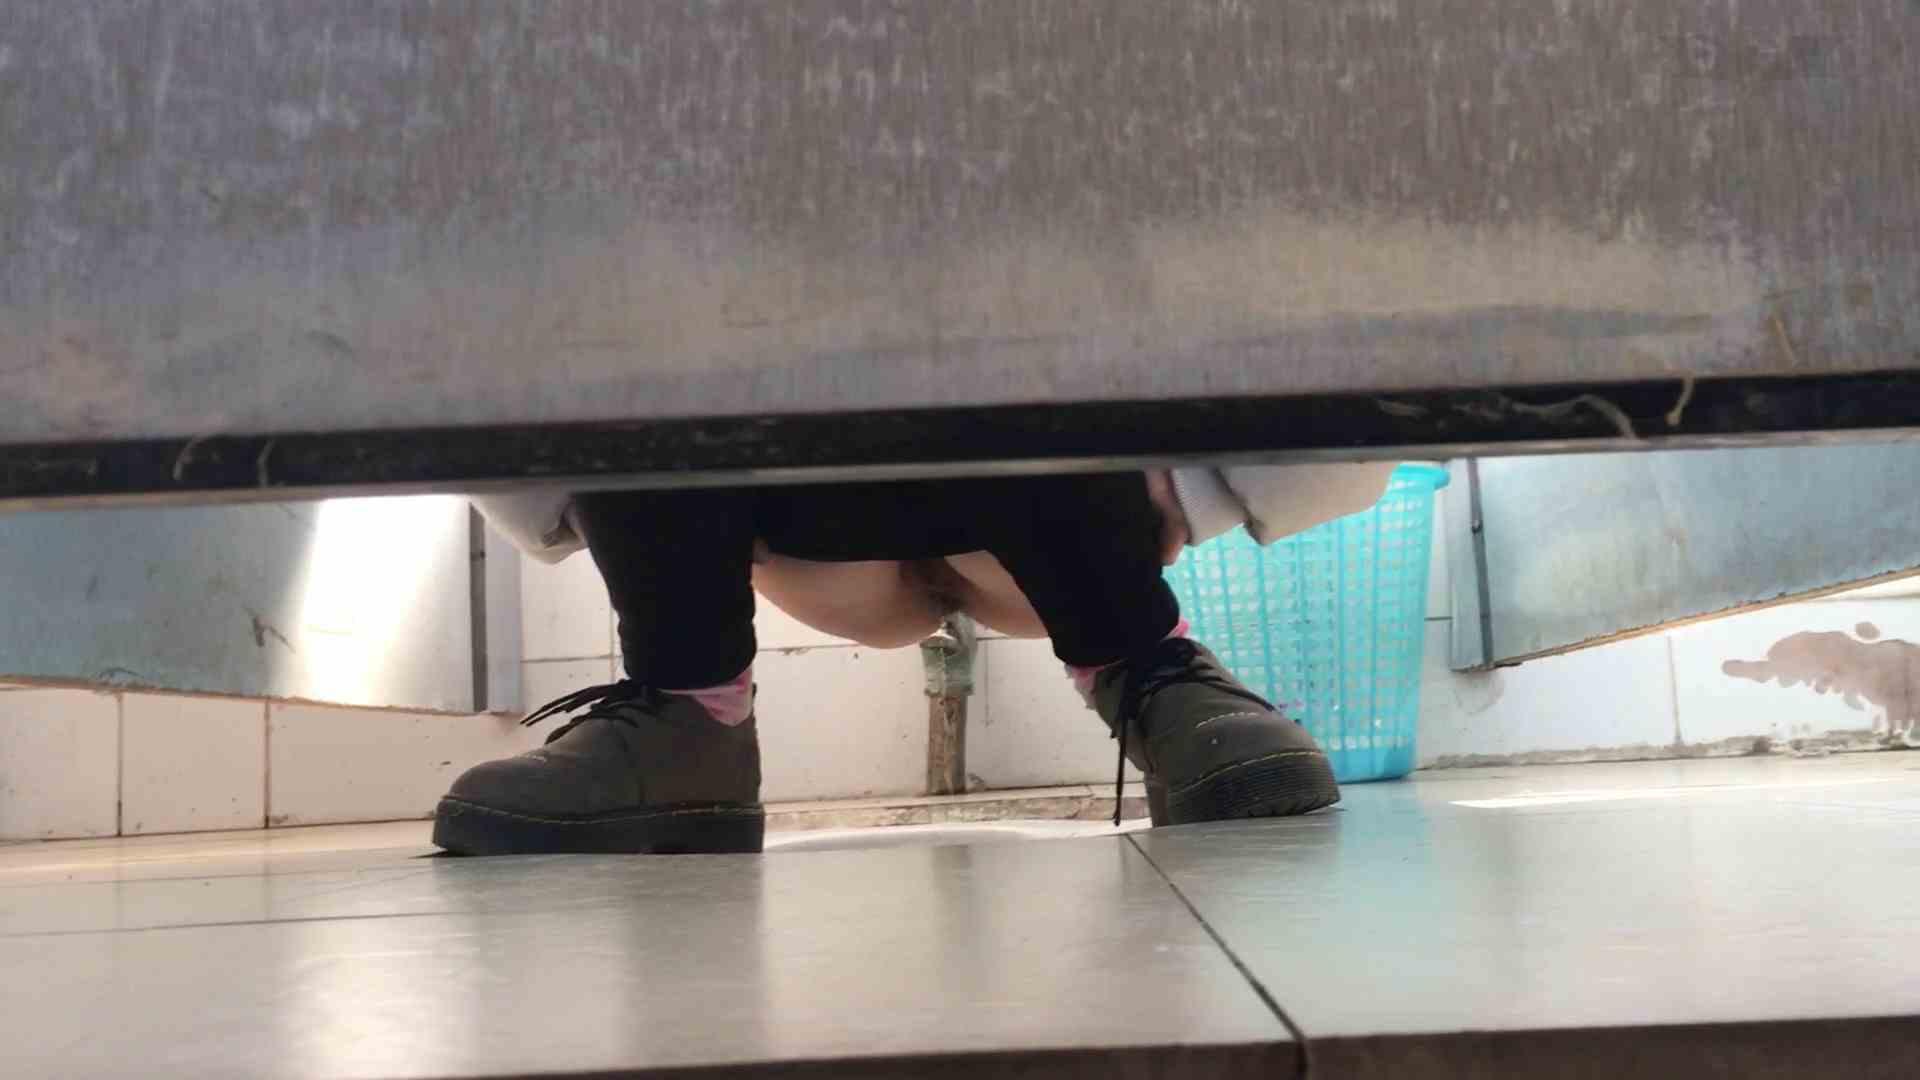 芸術大学ガチ潜入盗撮 JD盗撮 美女の洗面所の秘密 Vol.80 盛合せ  79PIX 30